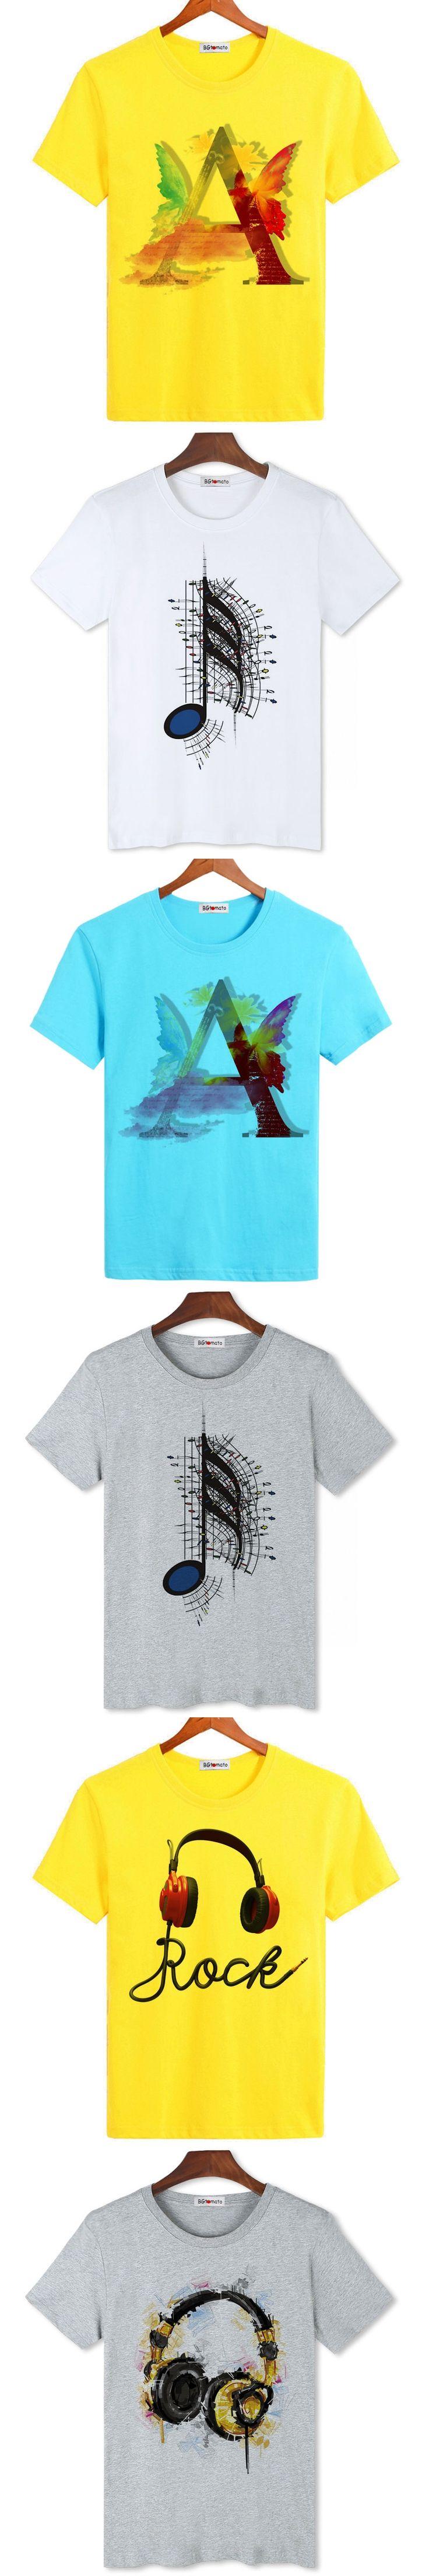 BGtomato love music art printing hot t shirts for men brand new fashion designer personality shirts cheap sale